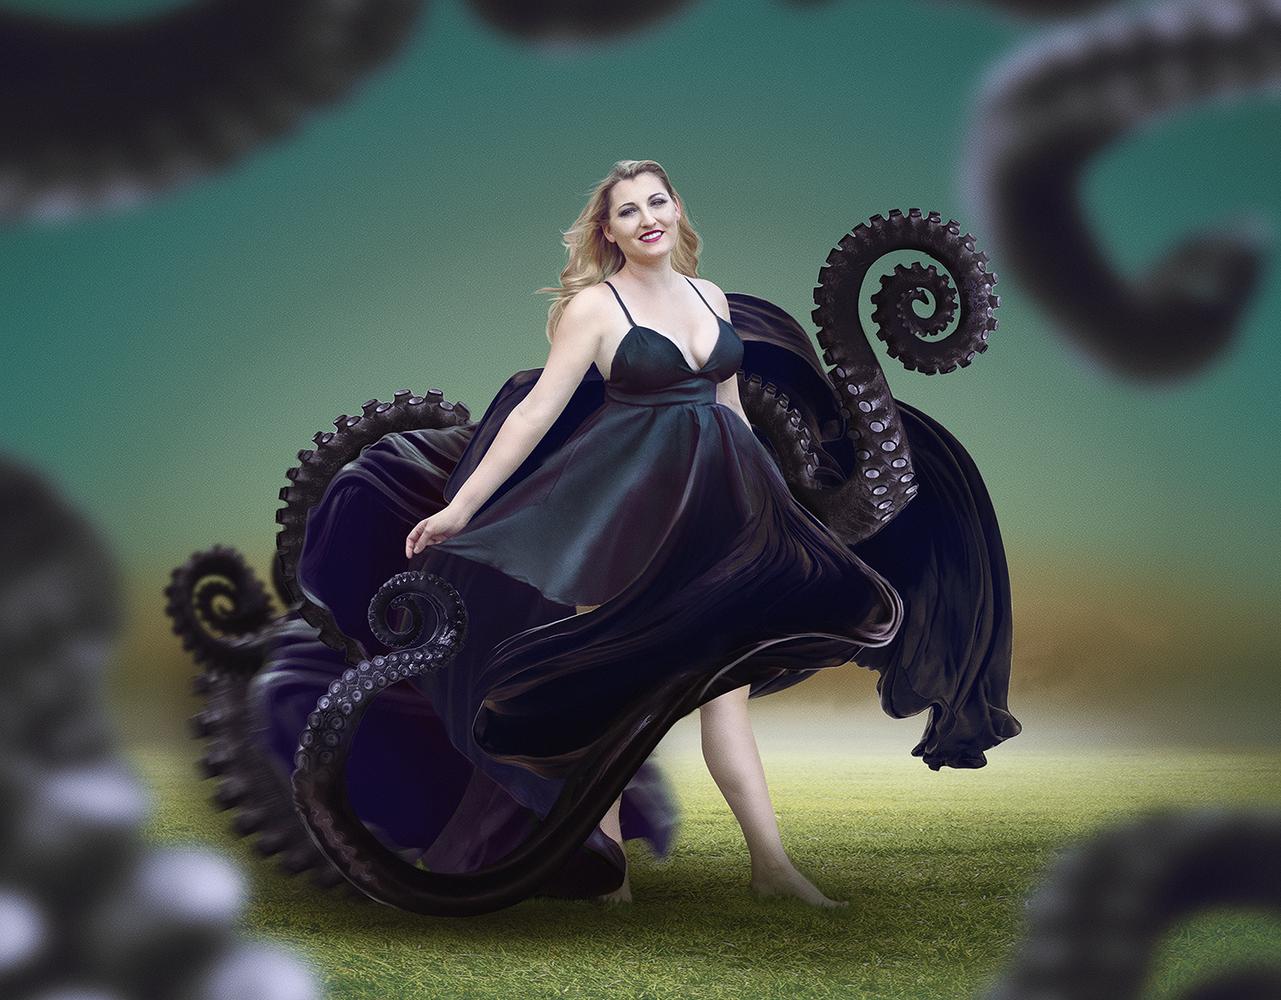 Octonity by Kat Armendariz